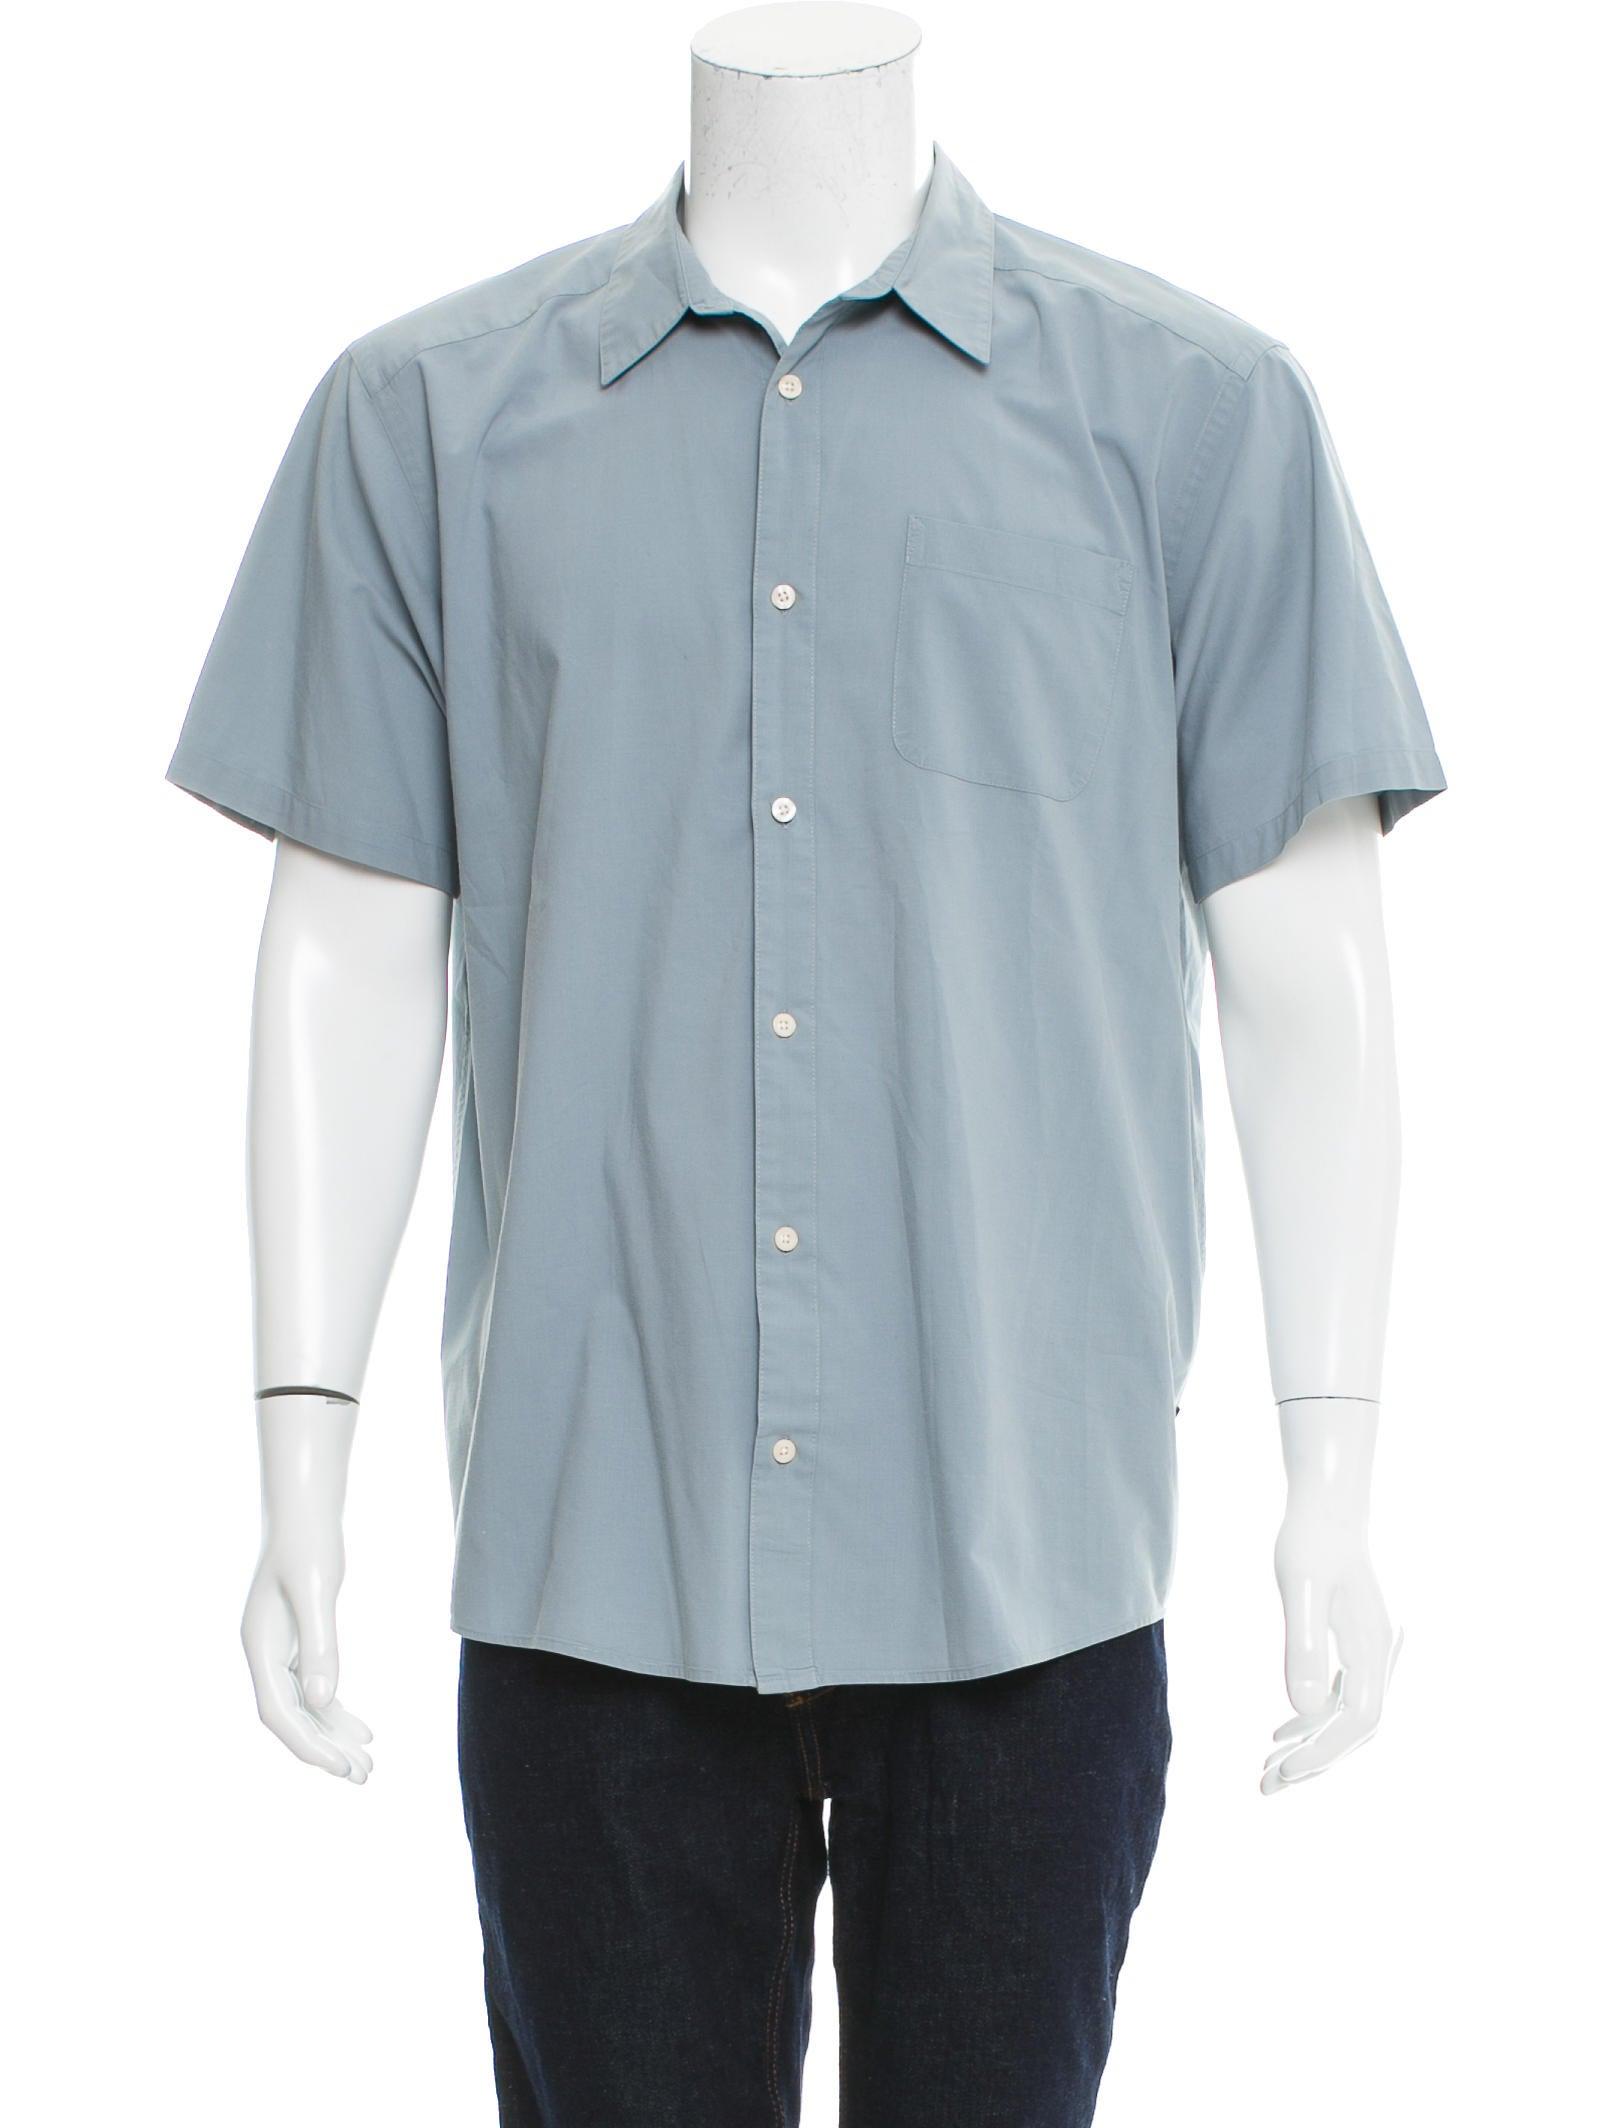 Patagonia Short Sleeve Button Up Shirt Clothing